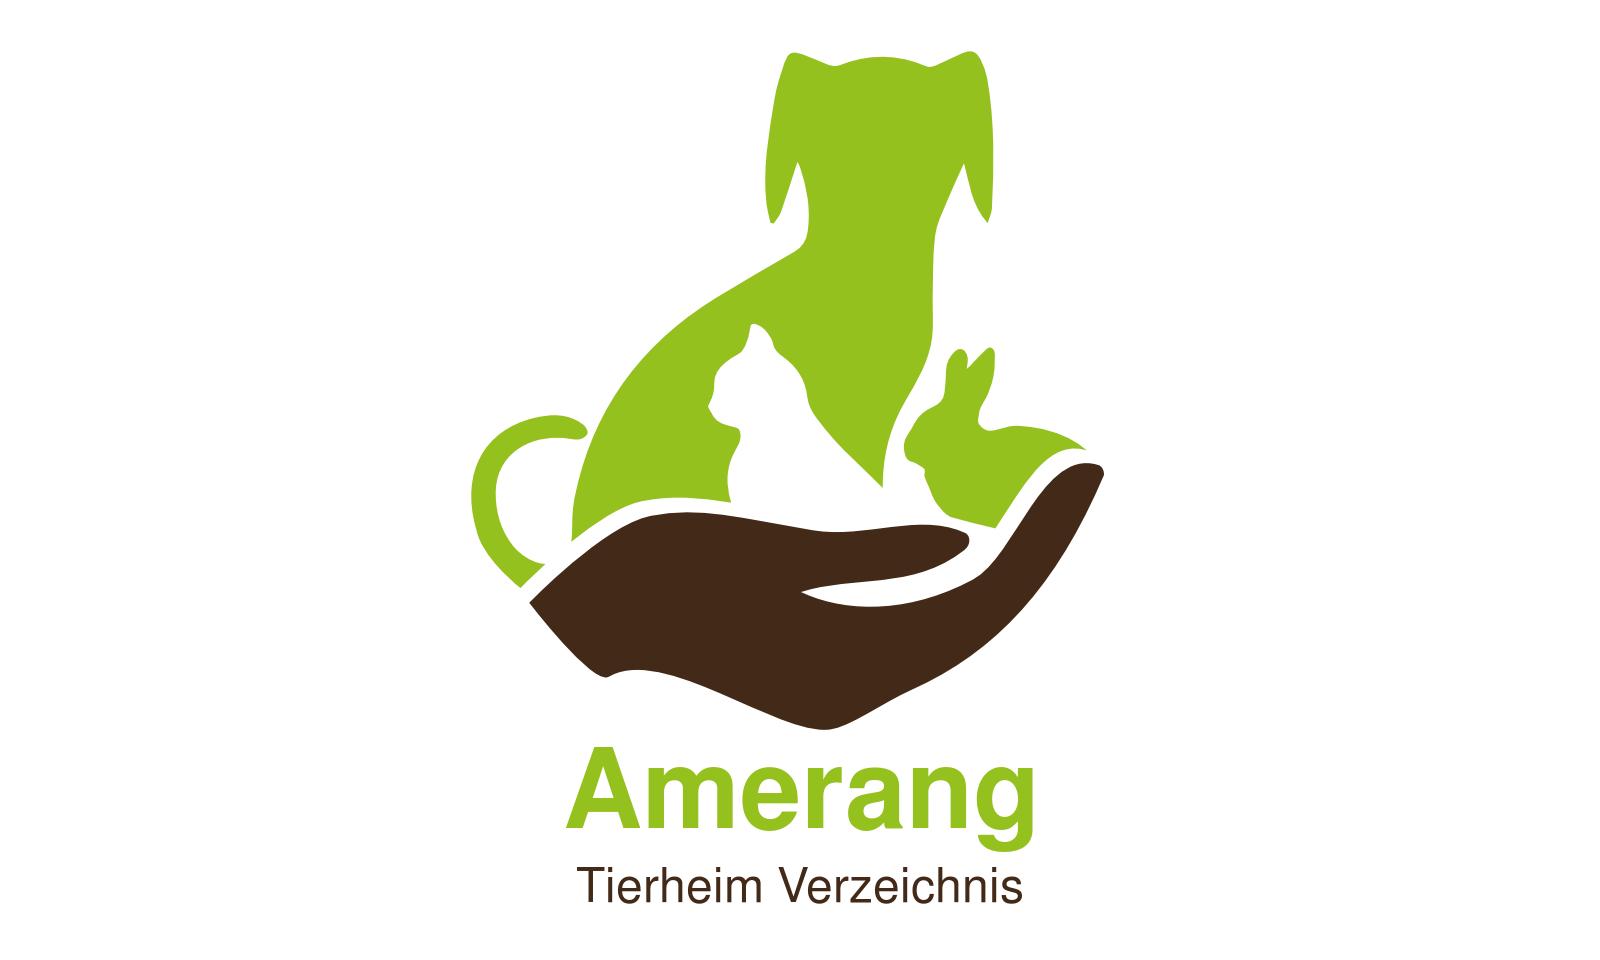 Tierheim Amerang